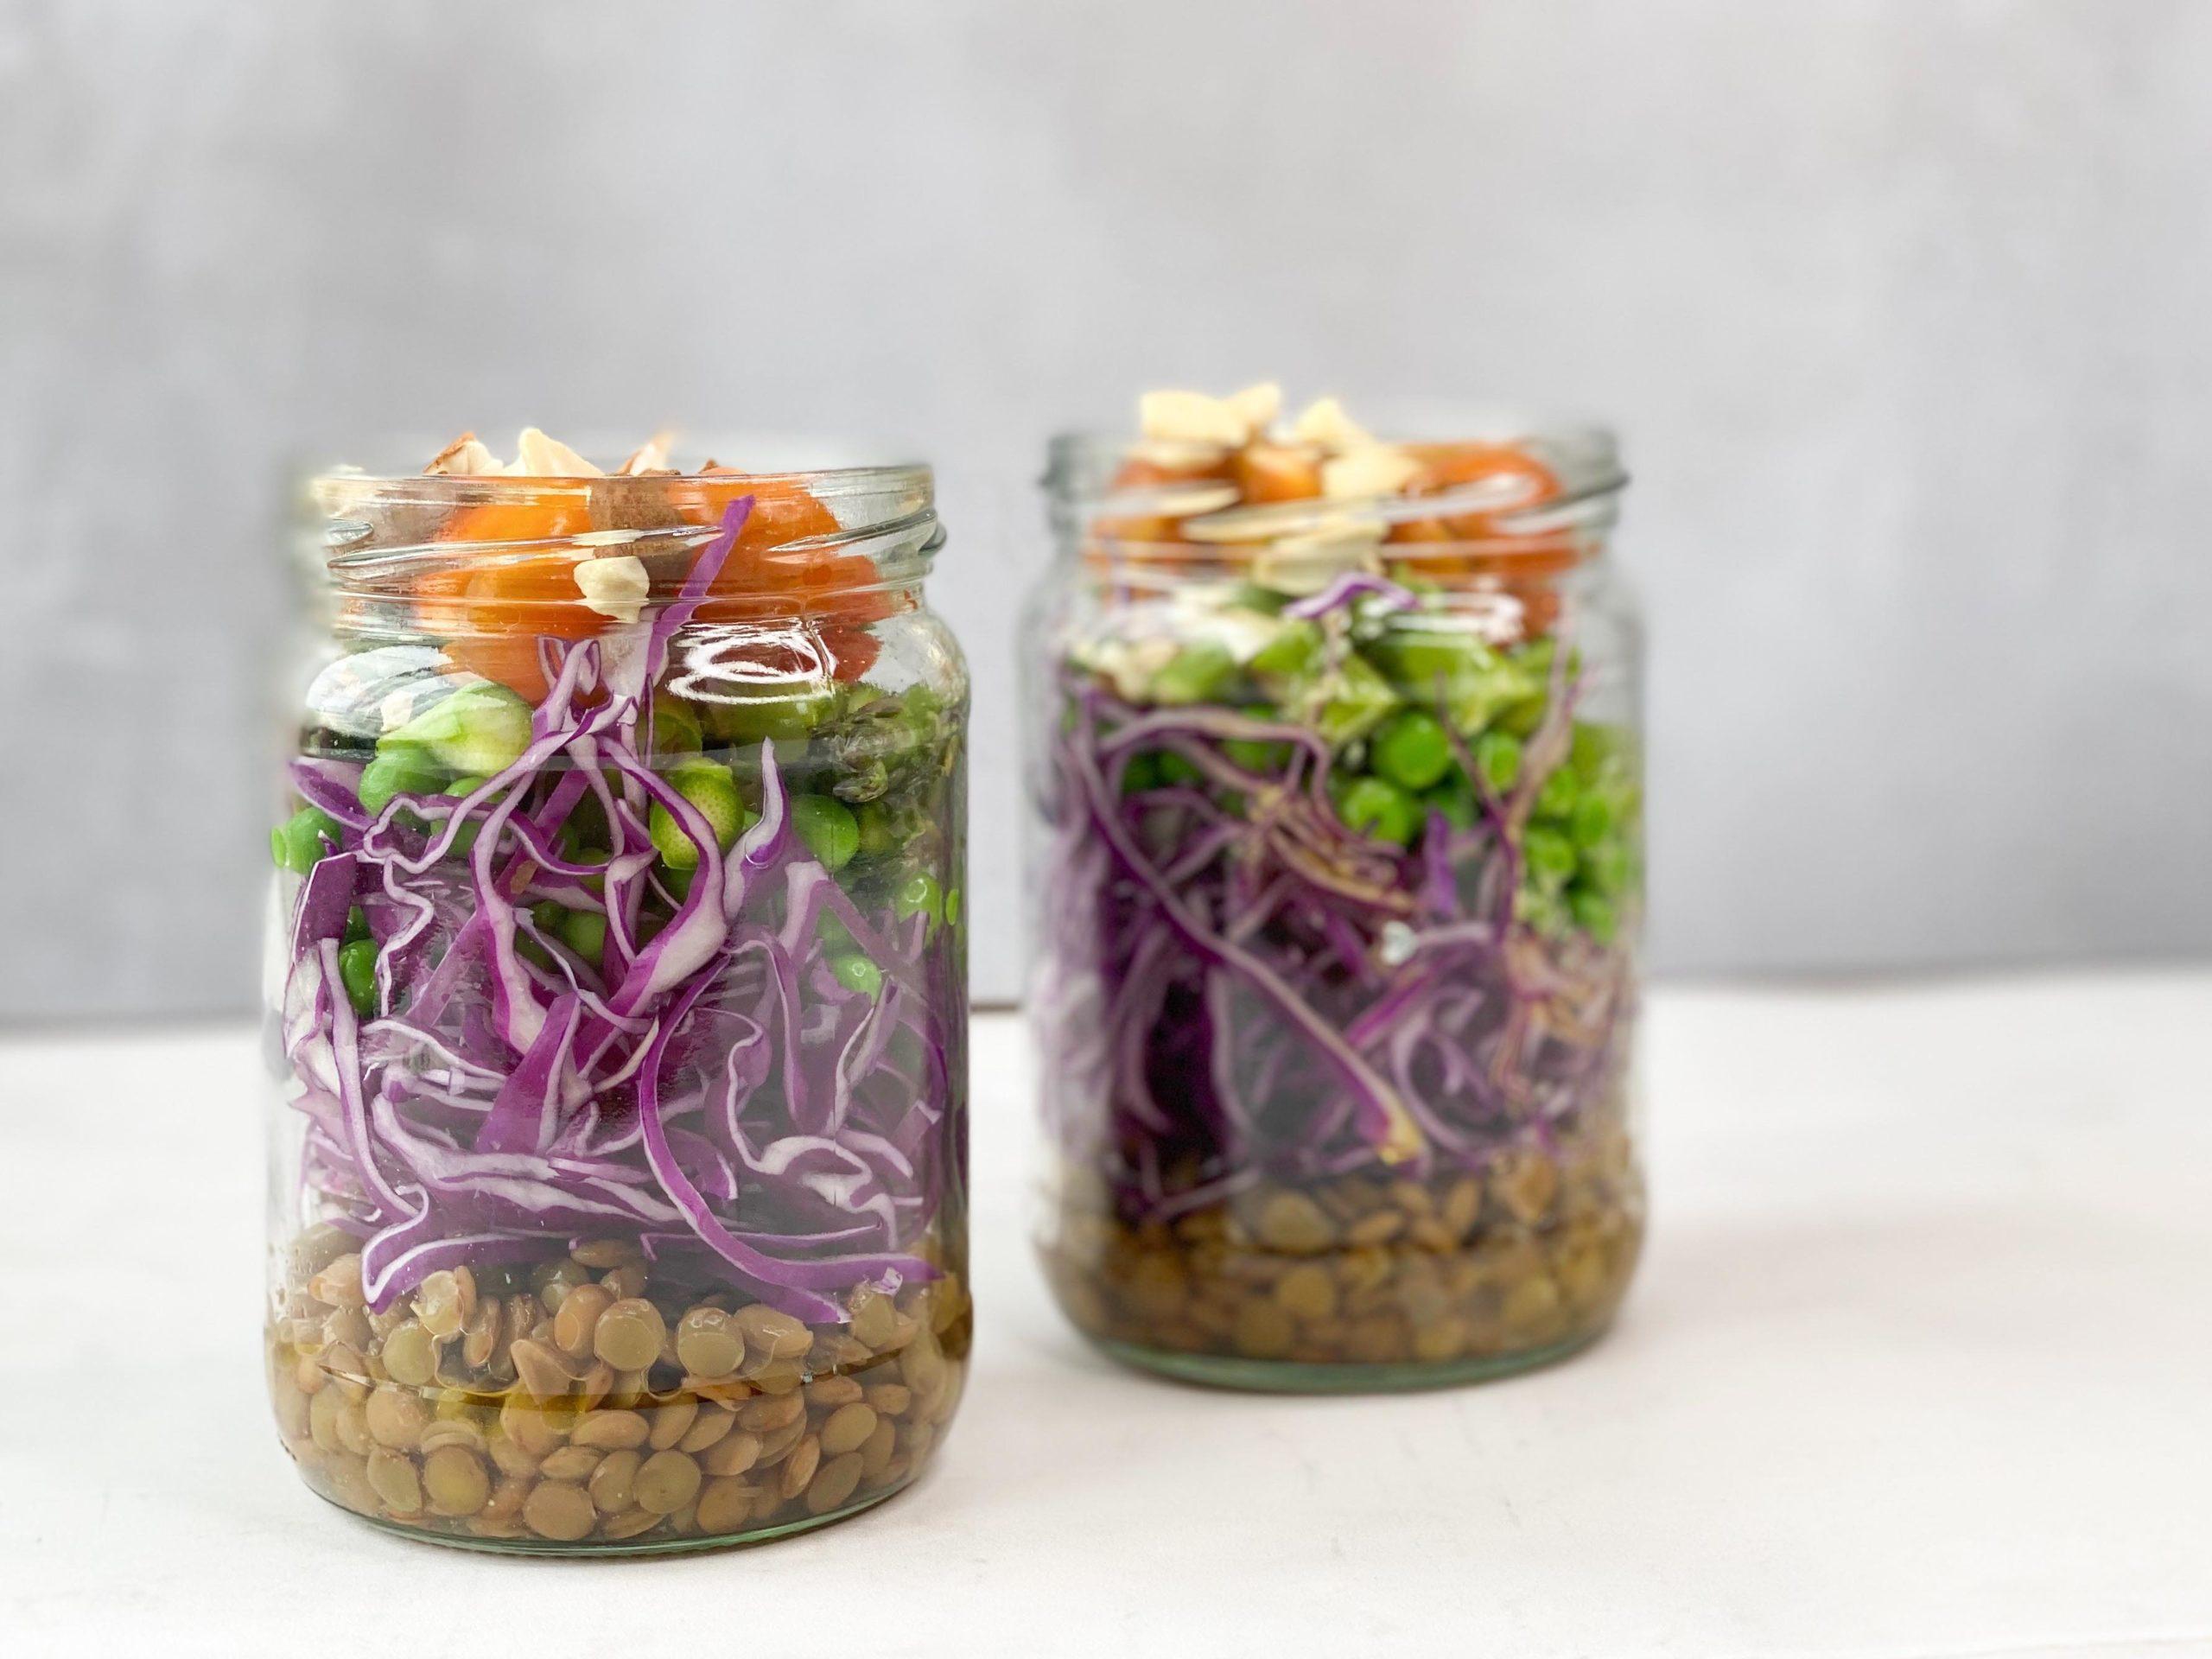 Salatbillede